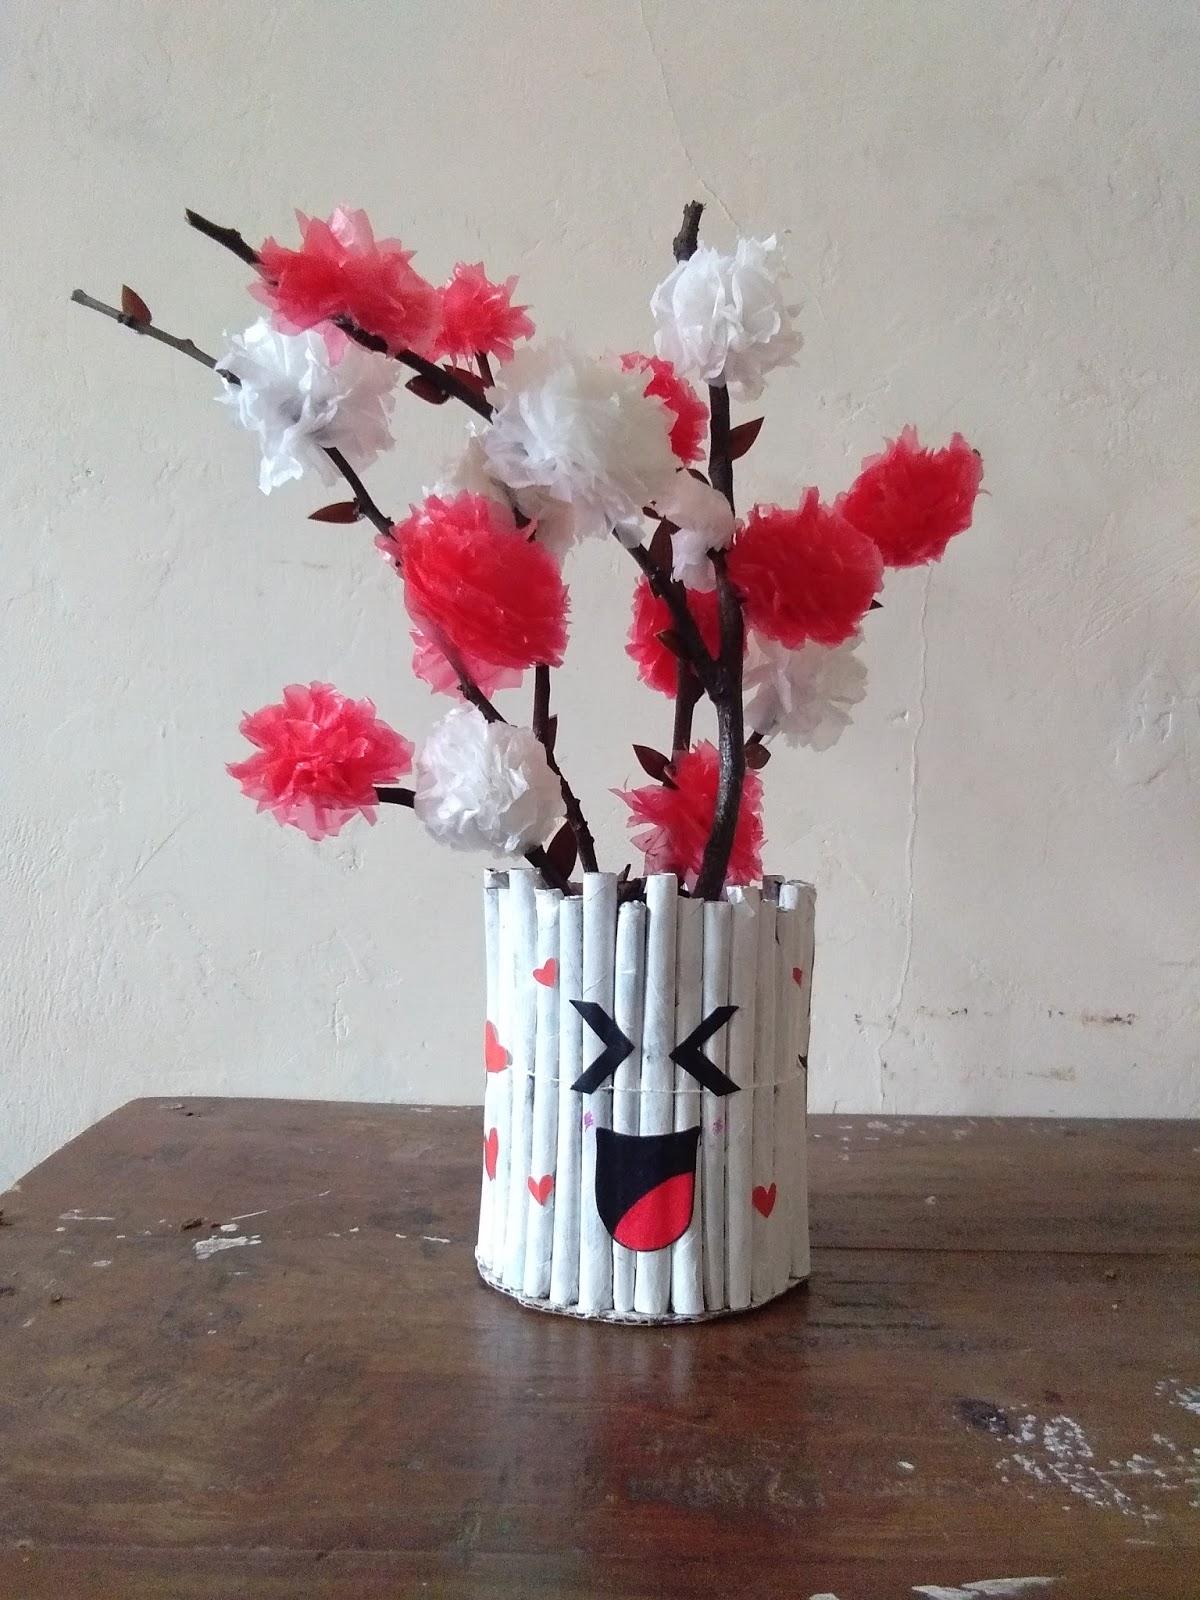 4574ac7b9 Infinitely: Kerajinan Bunga dari Kantong Plastik